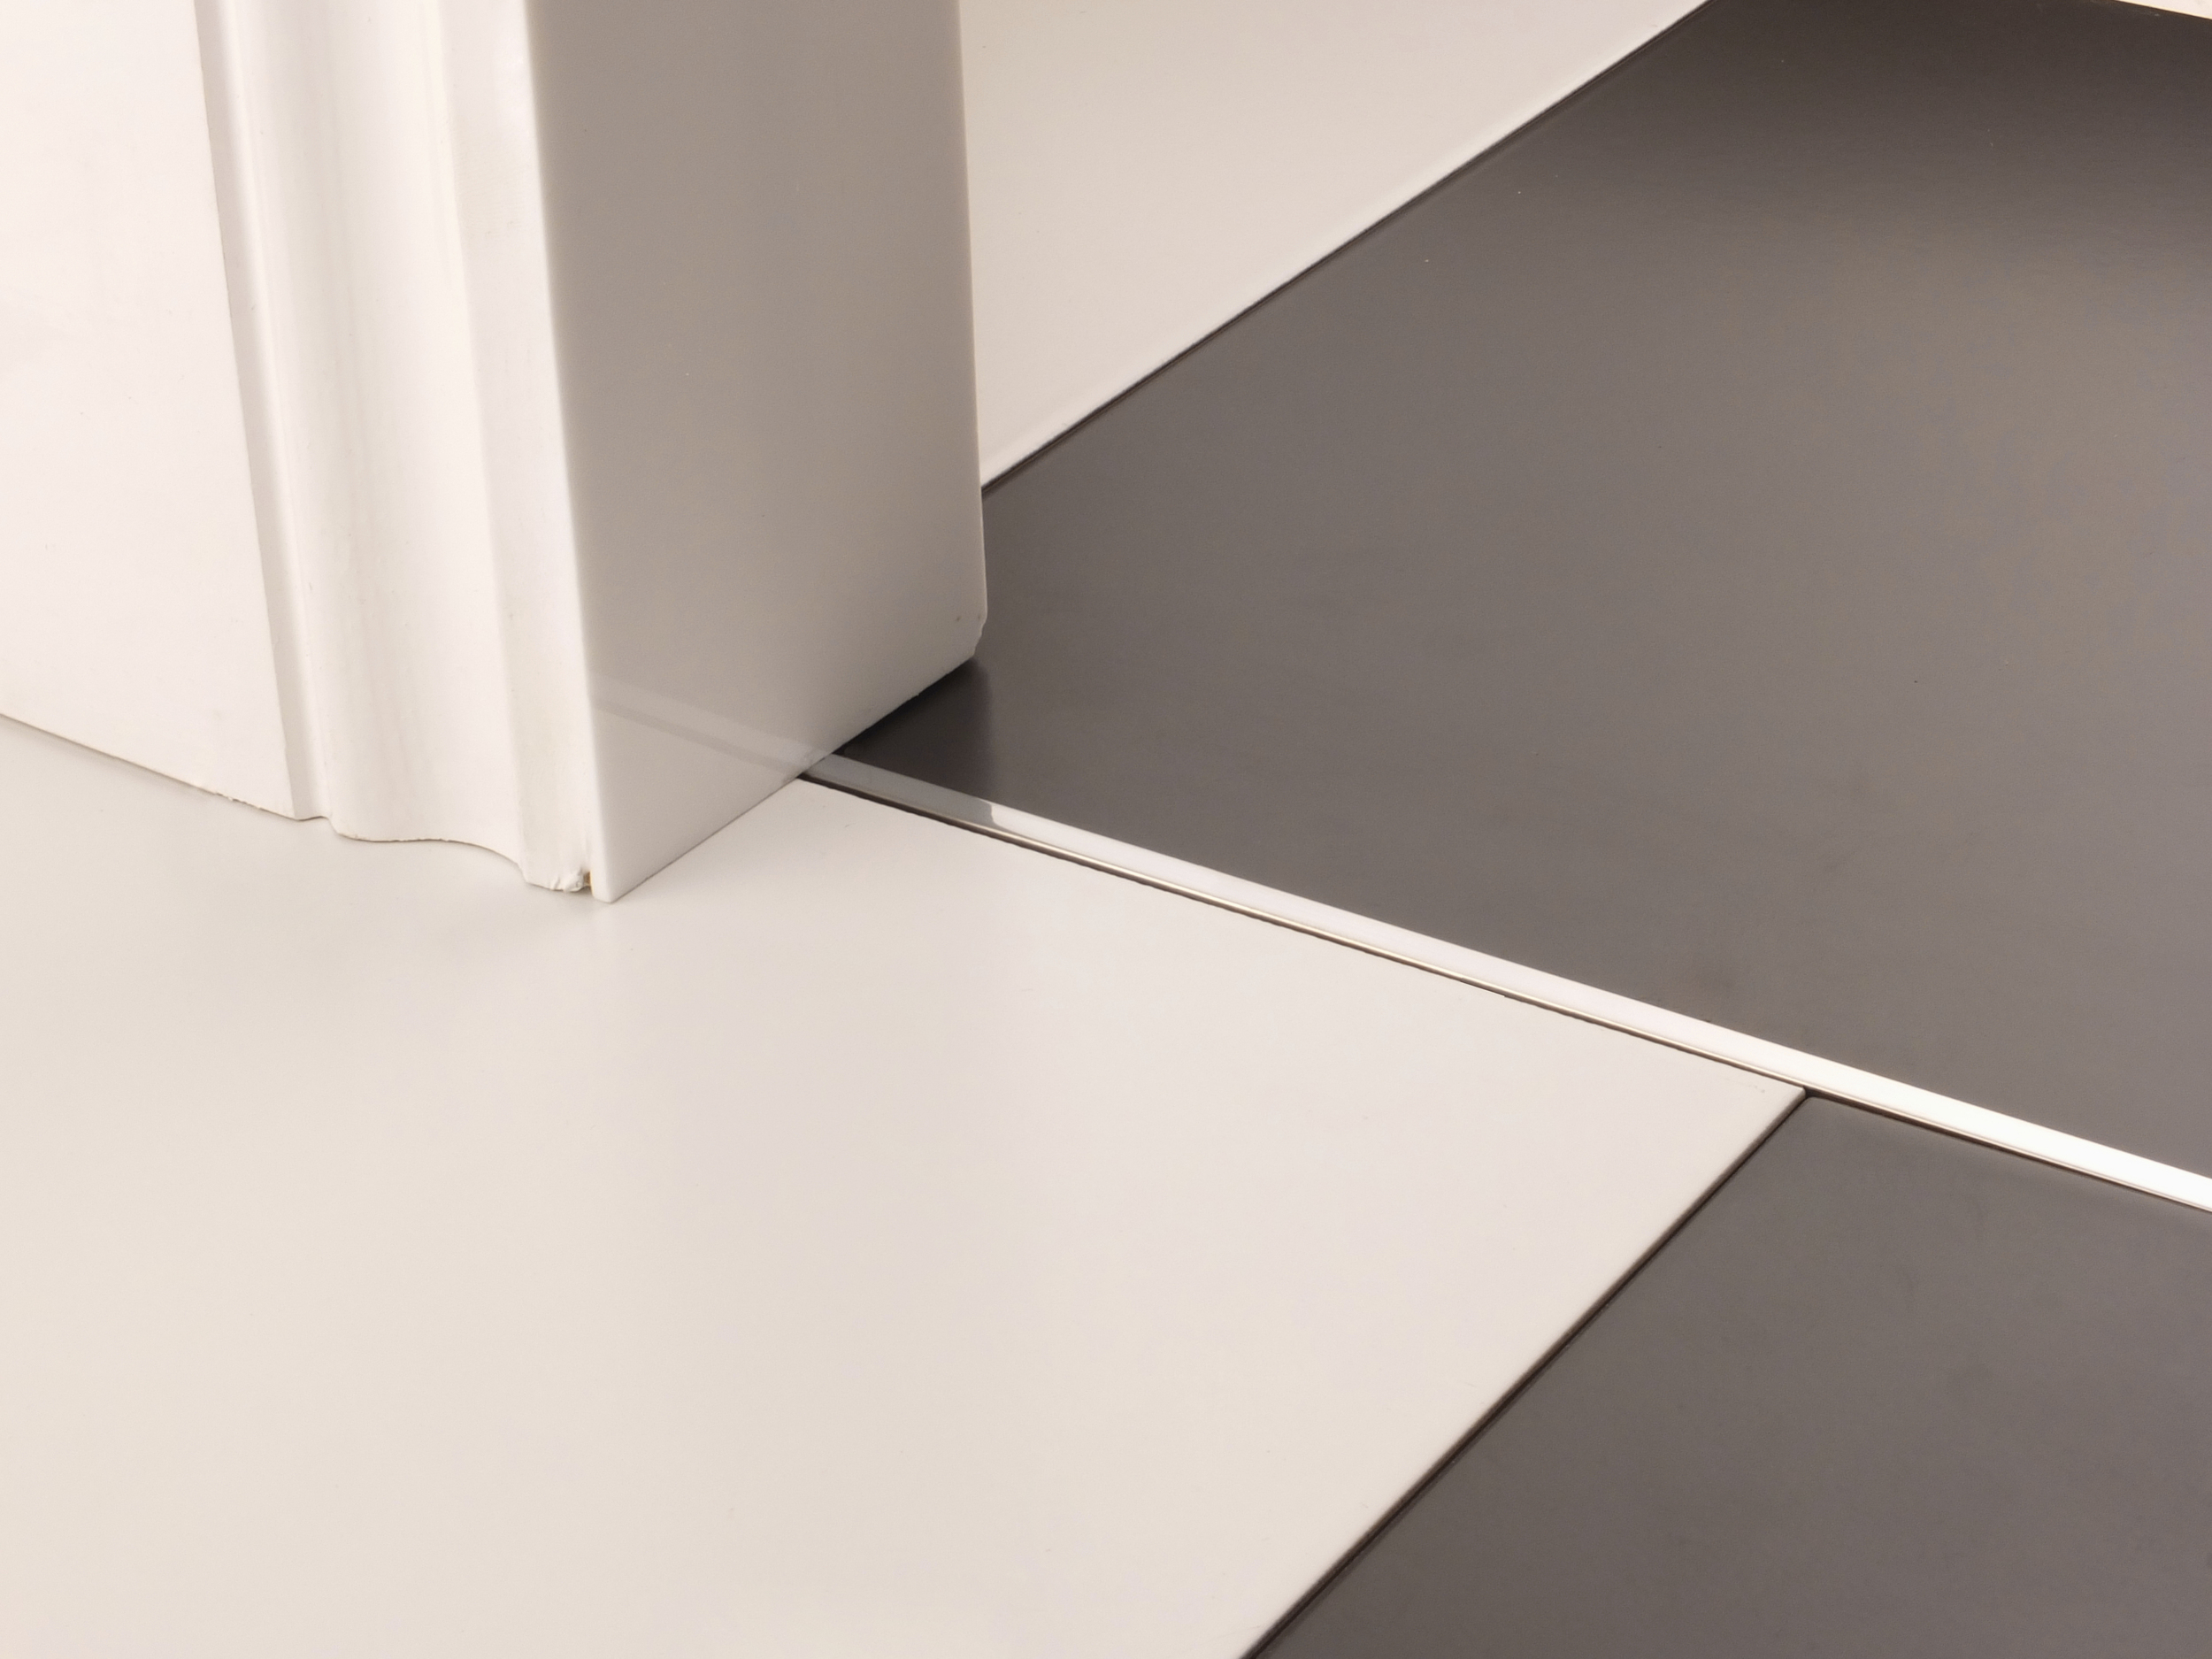 stairrods-doorbar-brushed-chrome-divider-HFHF.jpg